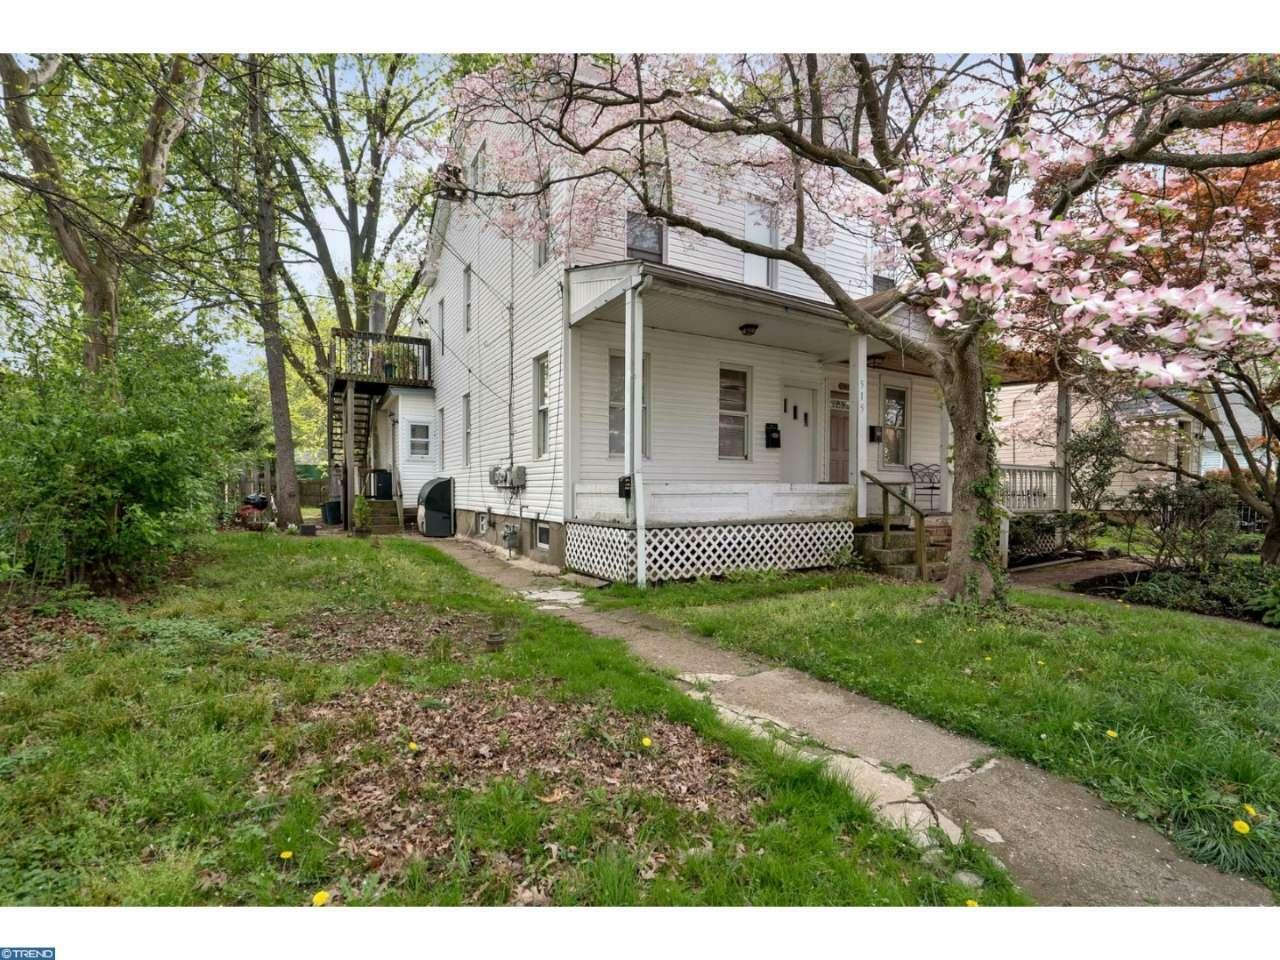 515 Crown St, Morrisville, PA - USA (photo 1)